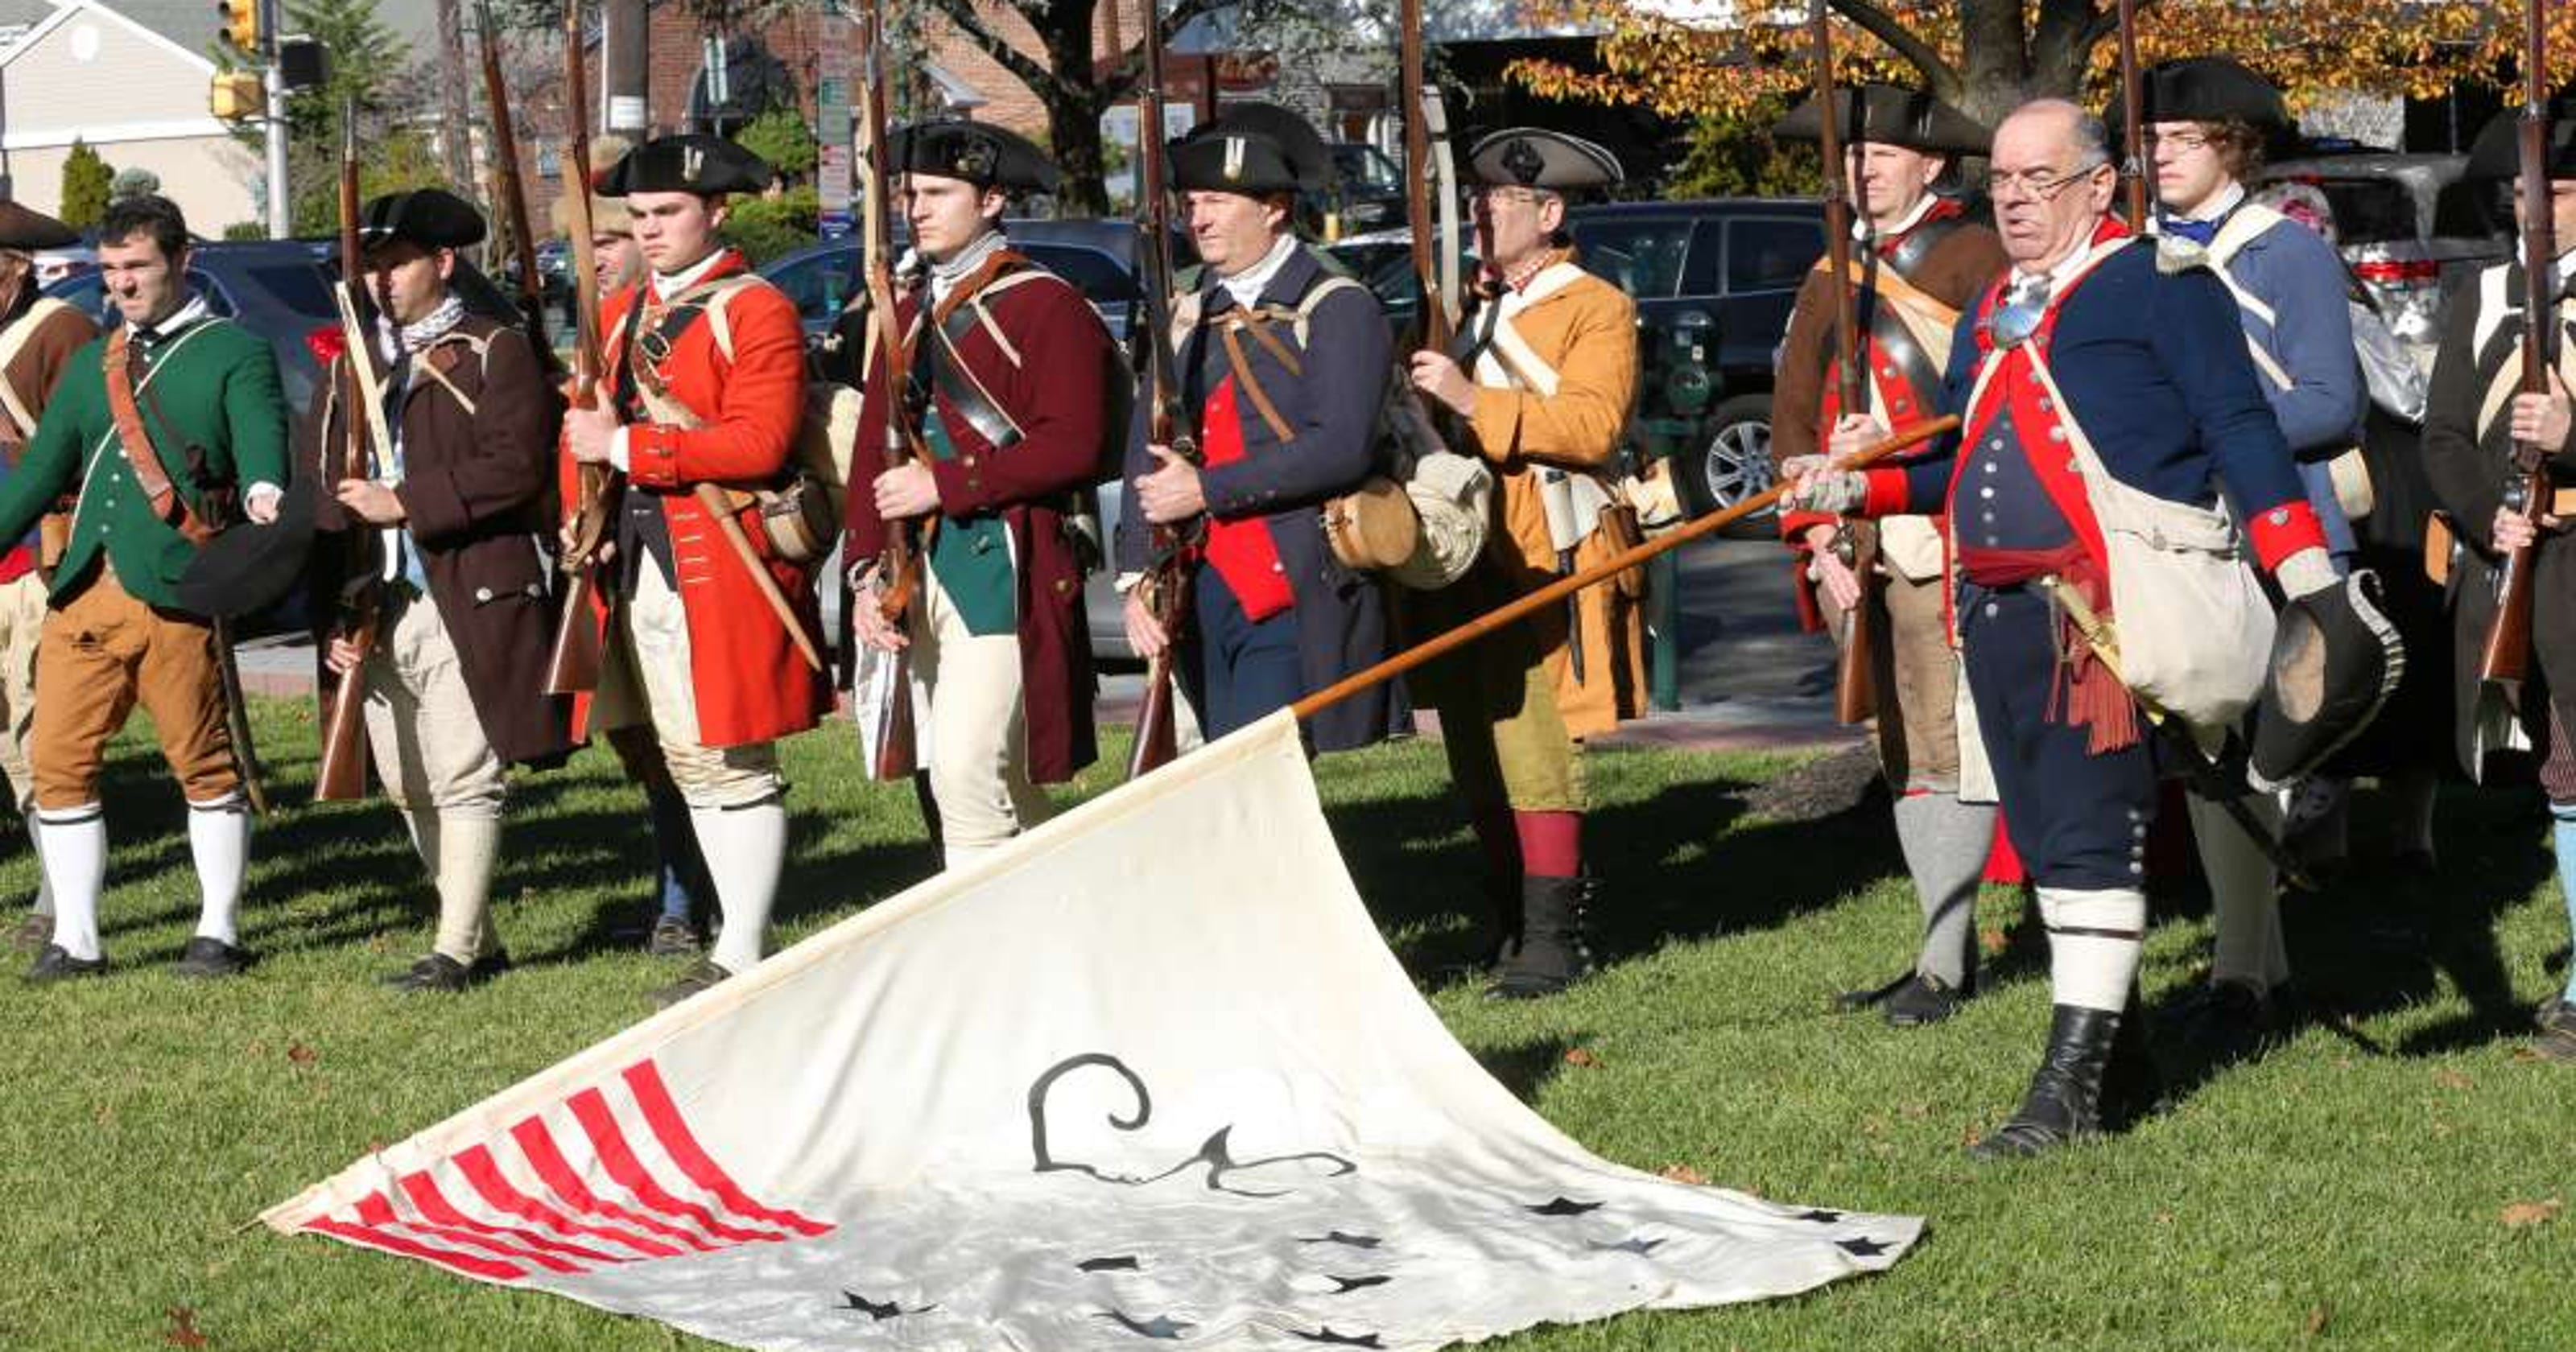 Revolutionary War reenactment in Fort Lee wins award